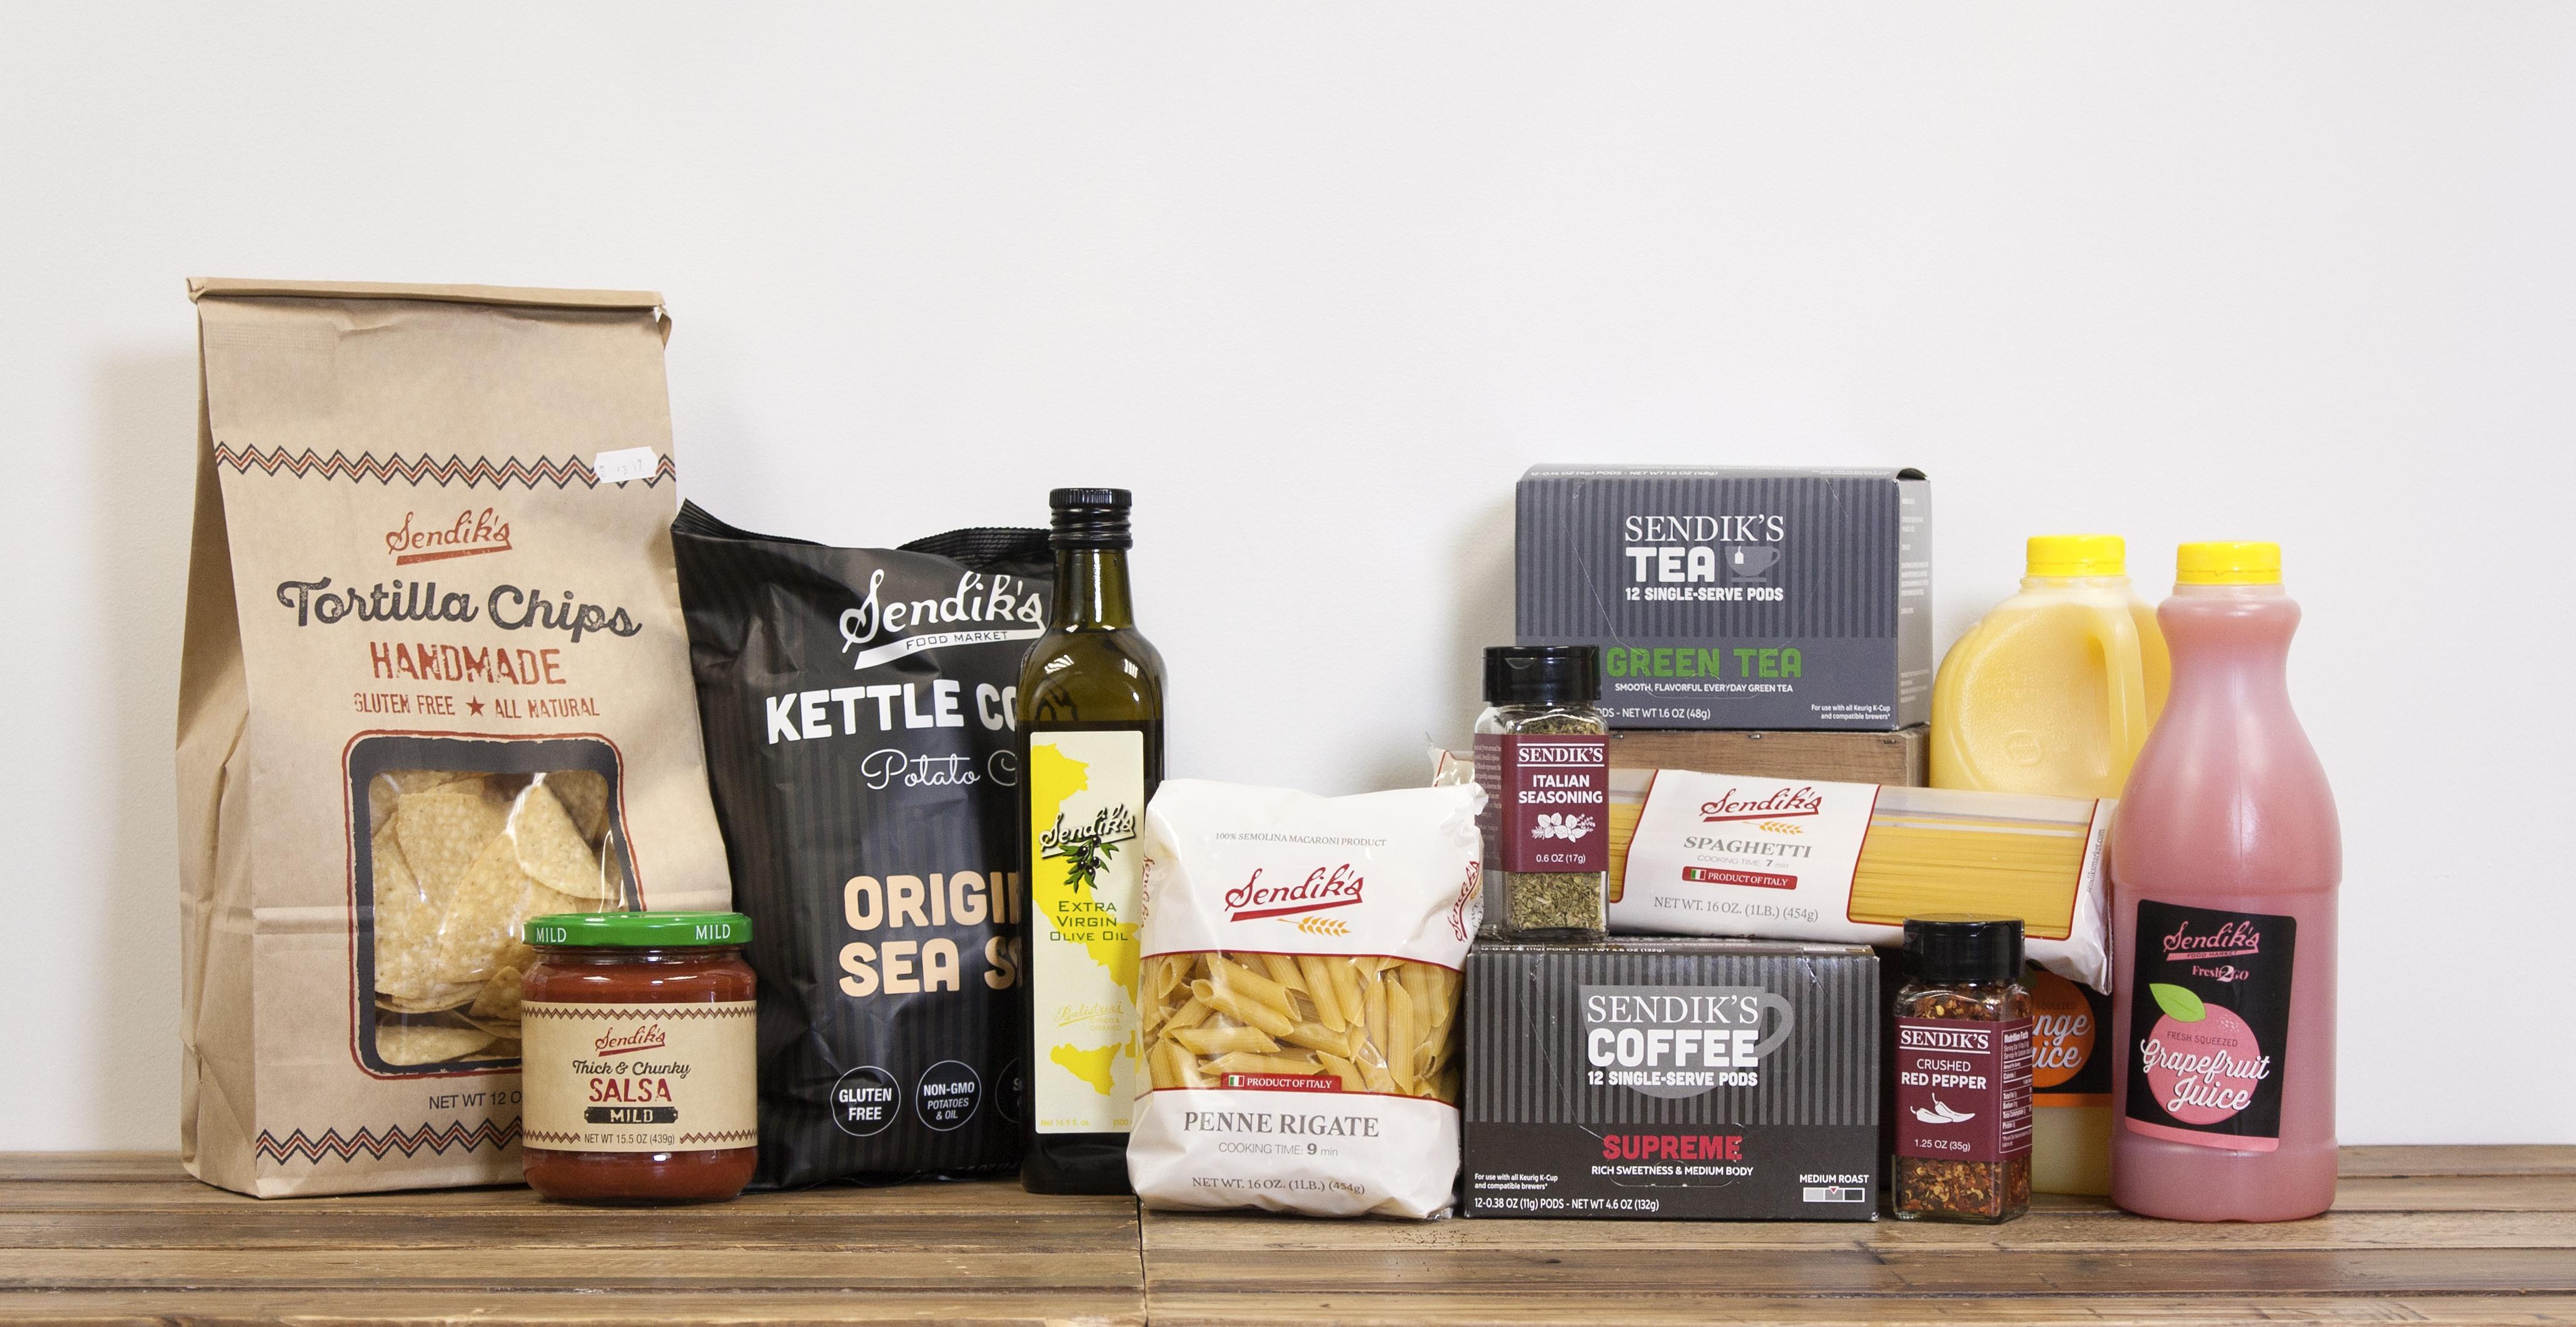 Sendik's Products